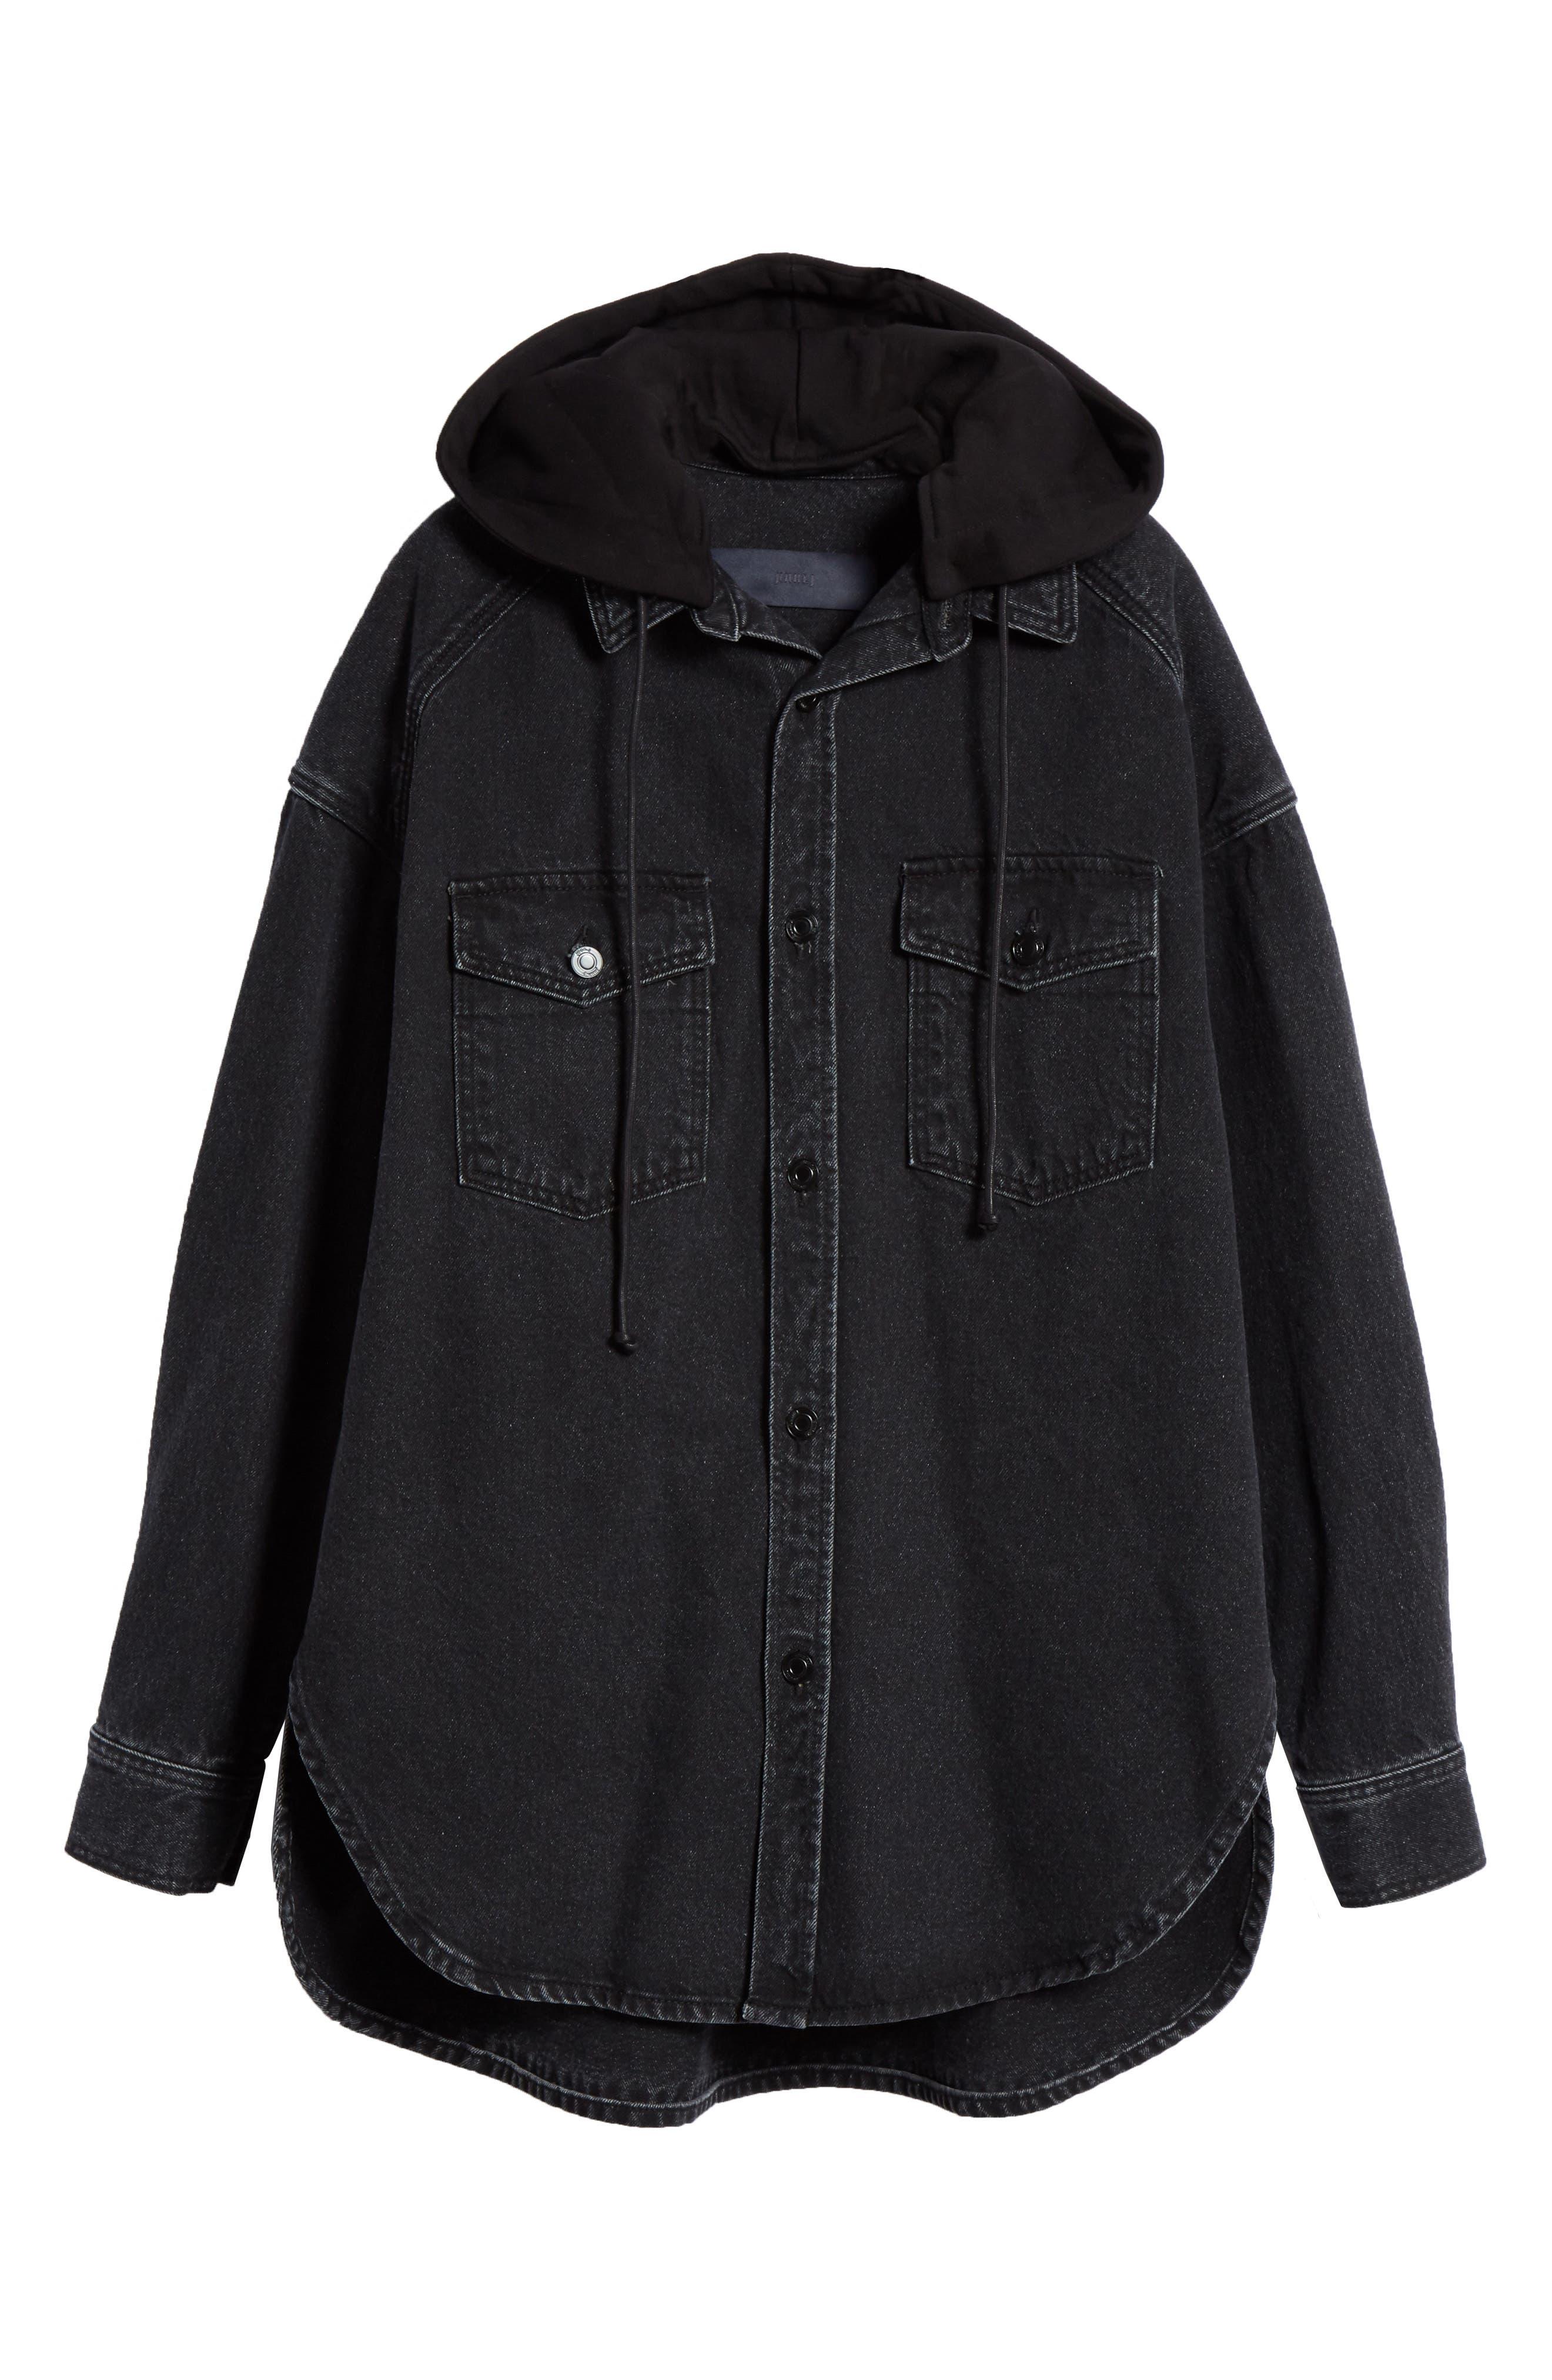 JUUN.J, Denim Shirt with Detachable Hood, Alternate thumbnail 6, color, BLACK